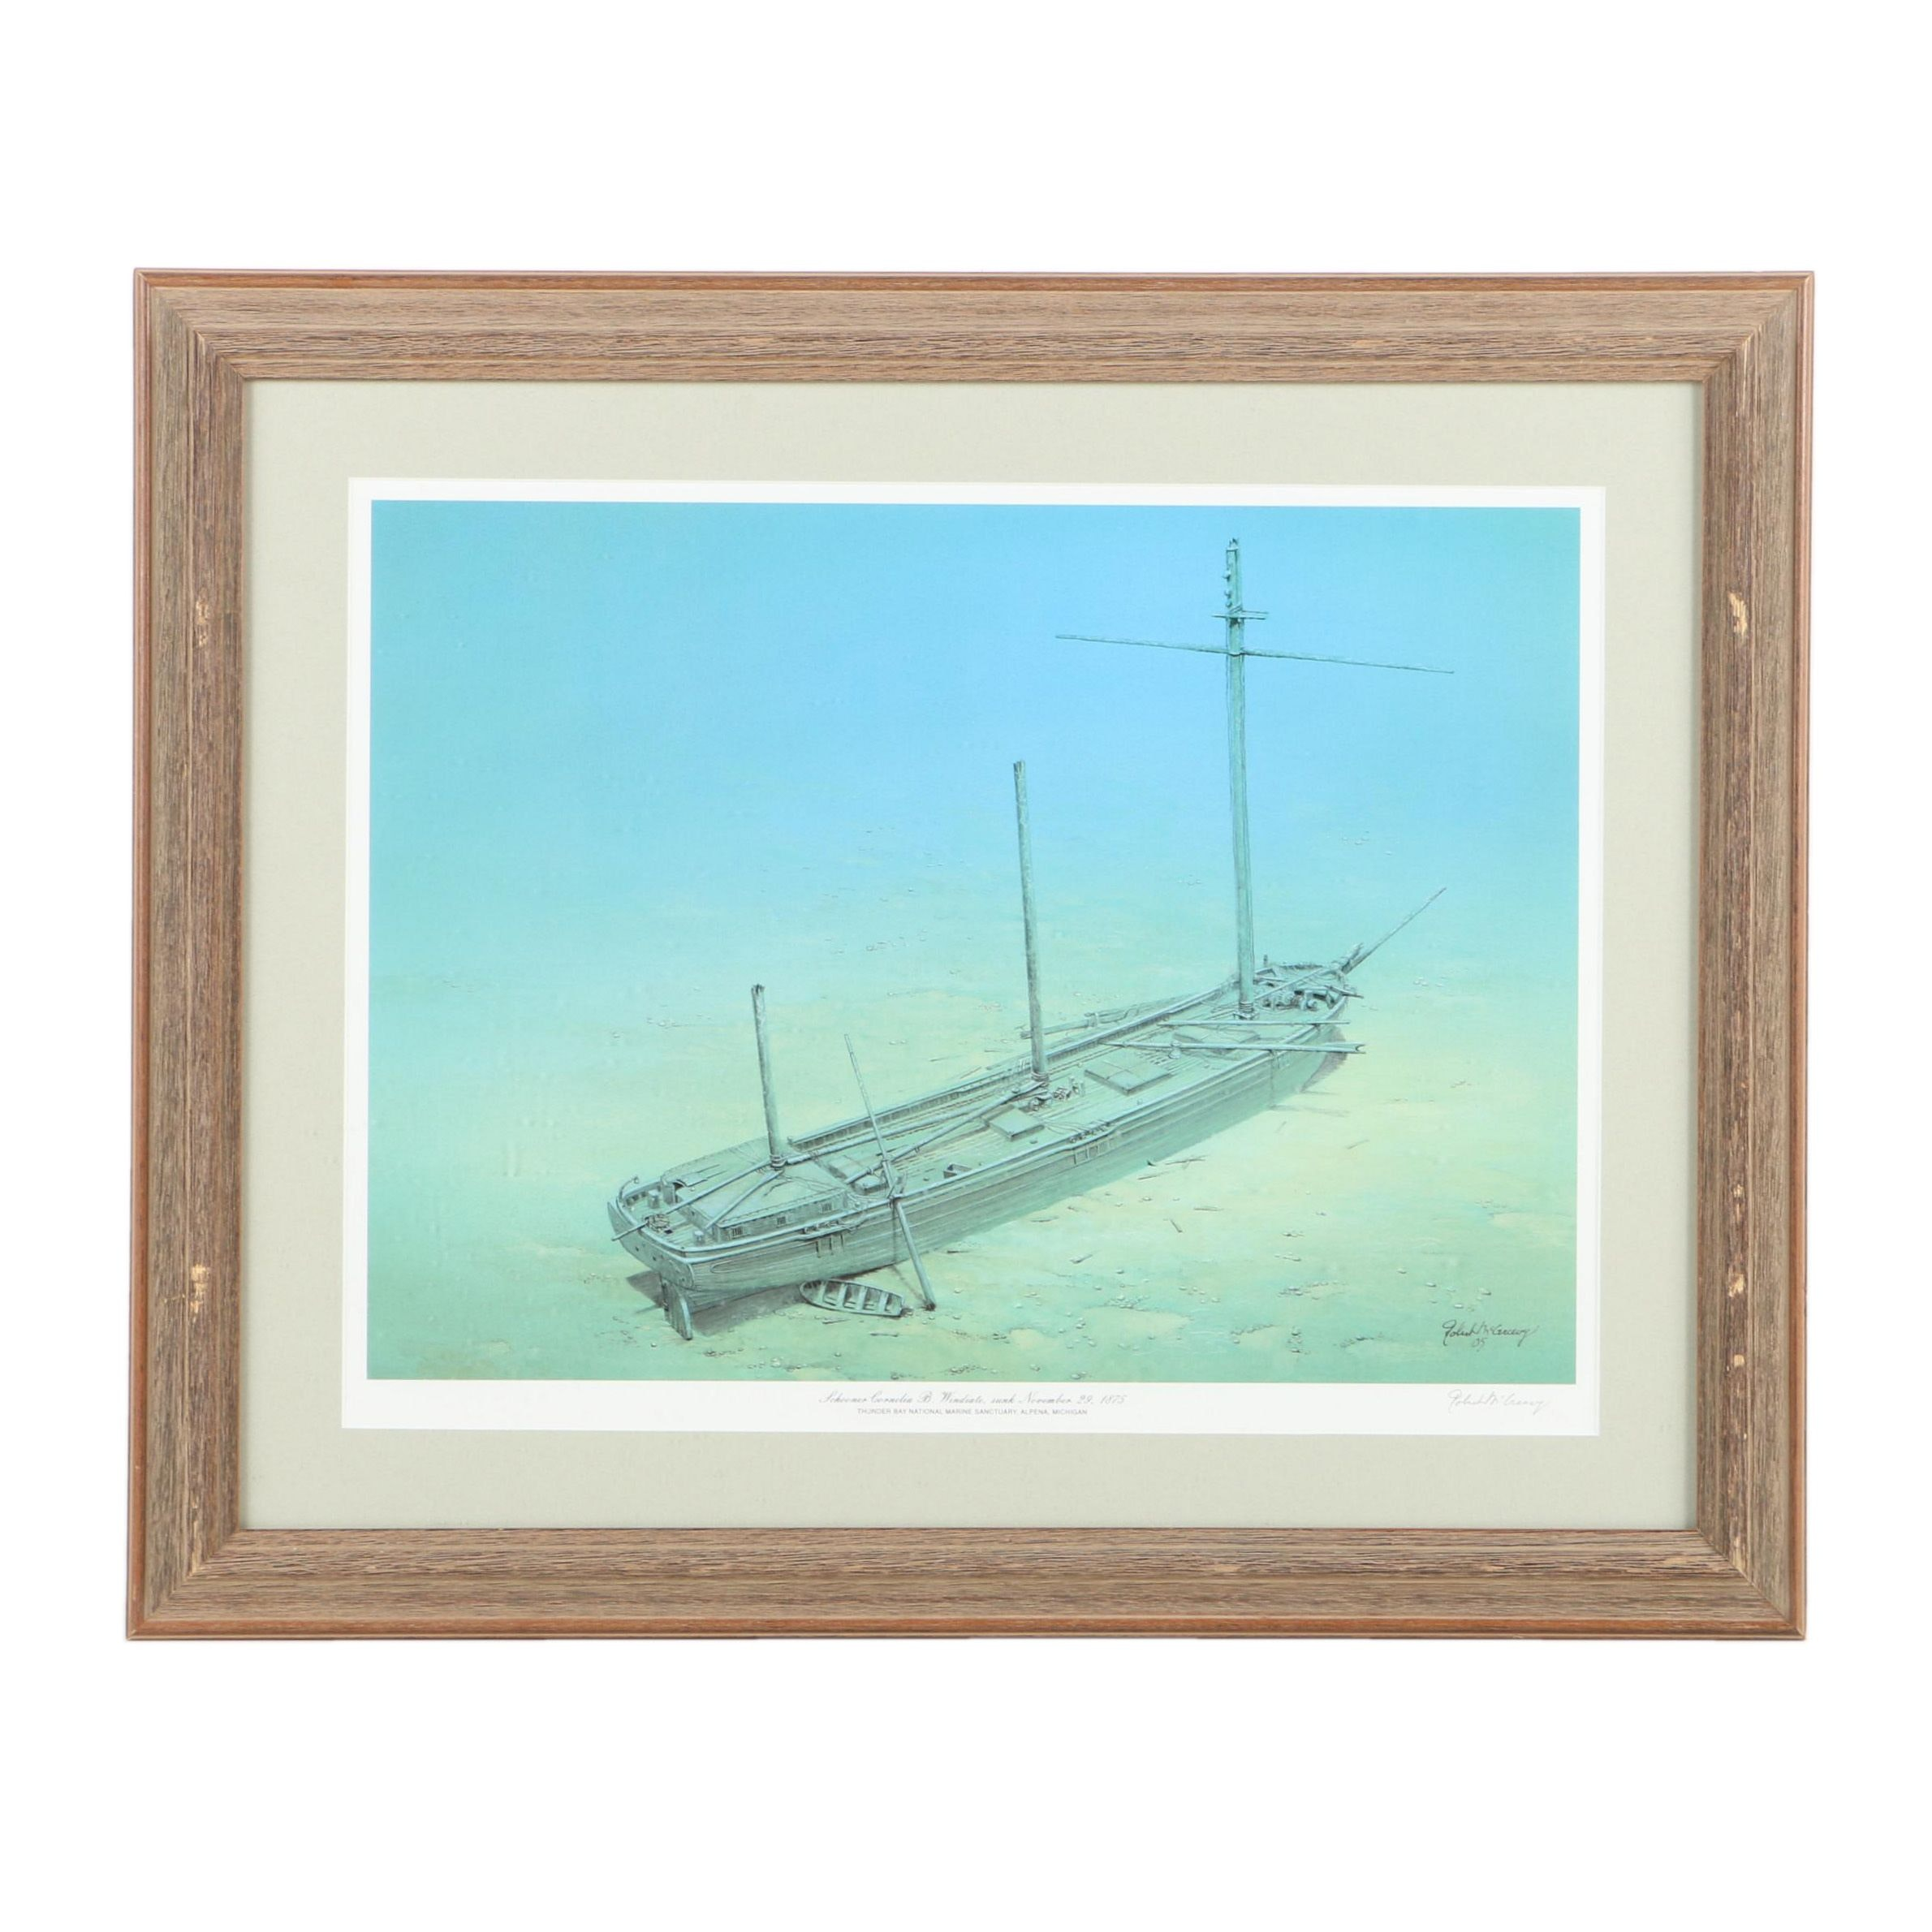 Offset Lithograph After Robert McGreevy of a Shipwreck